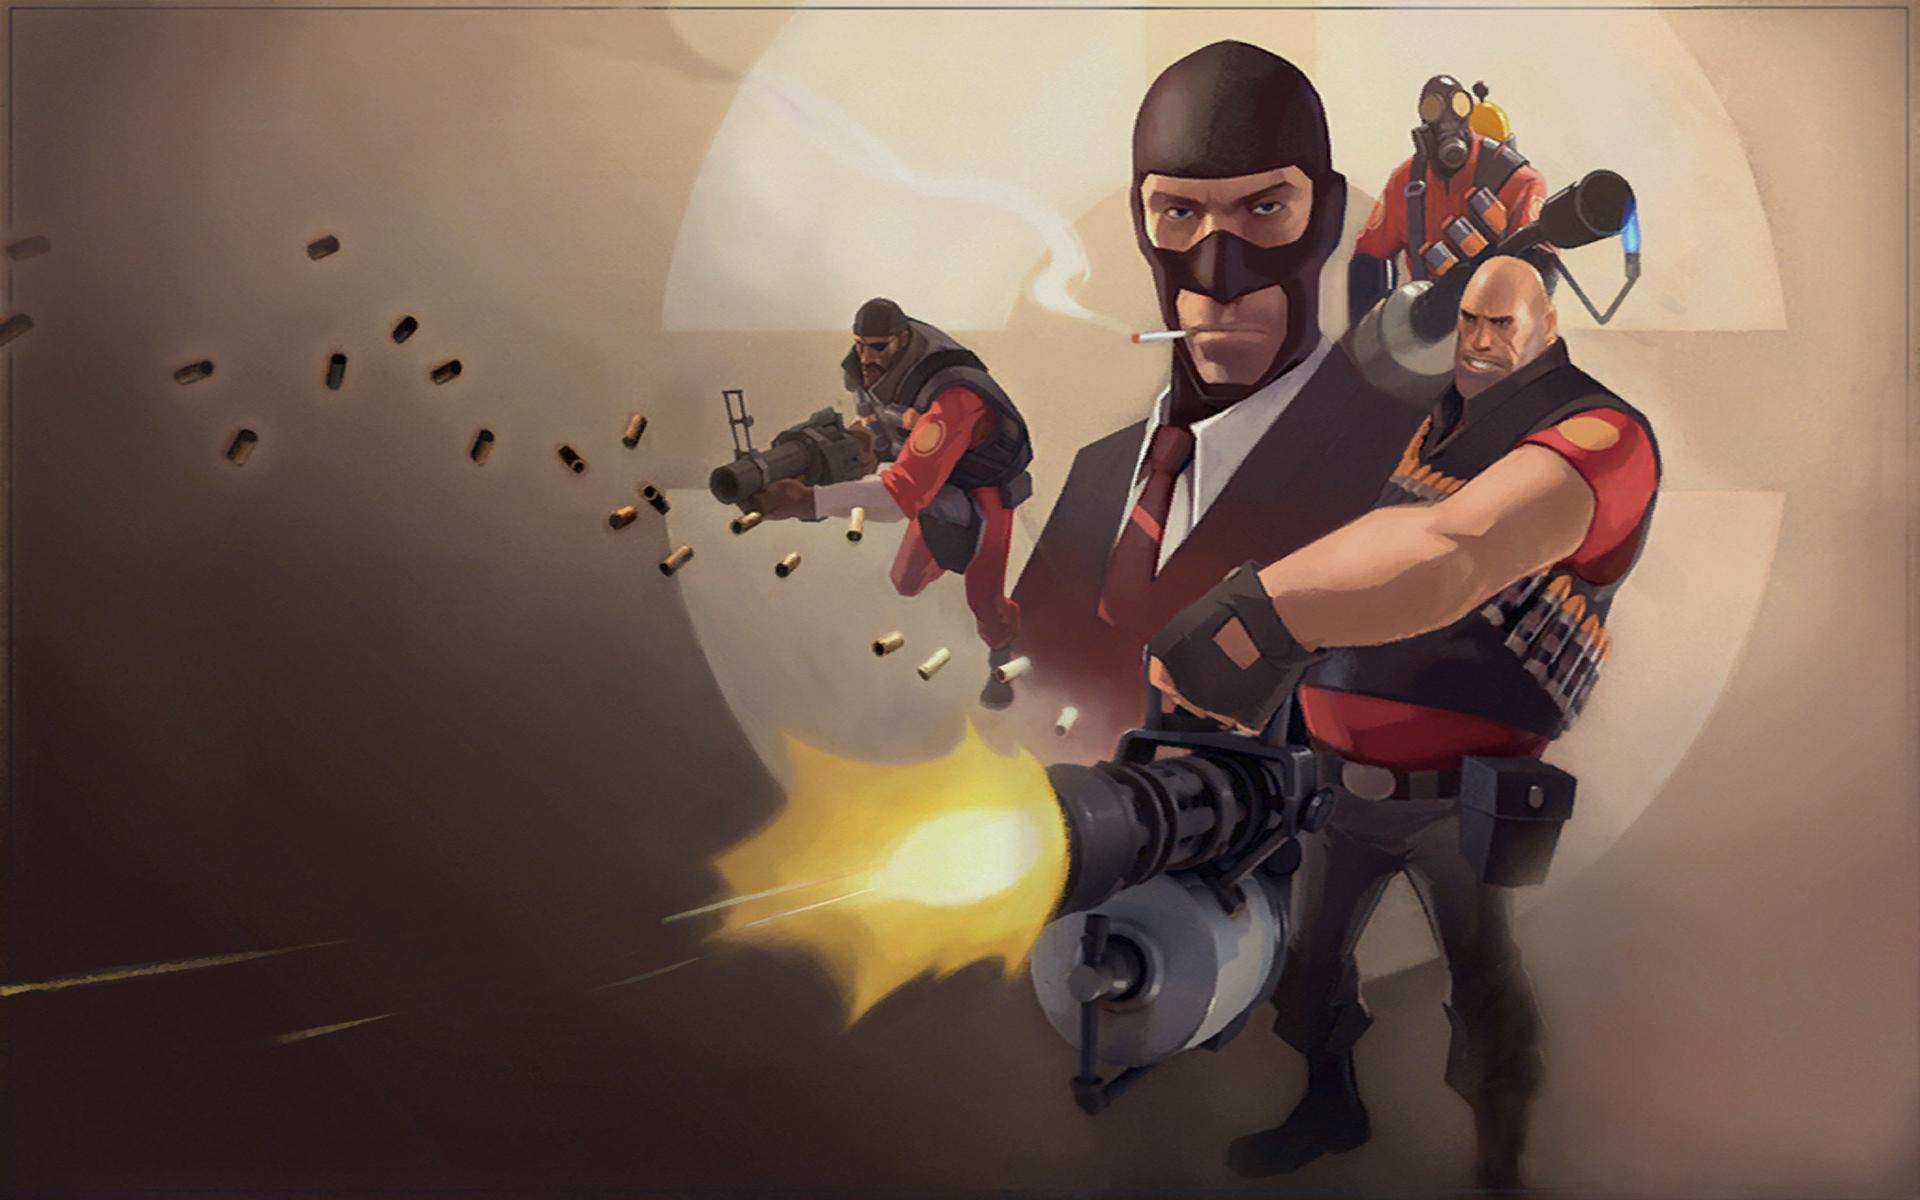 Team Fortress 2 Wallpaper